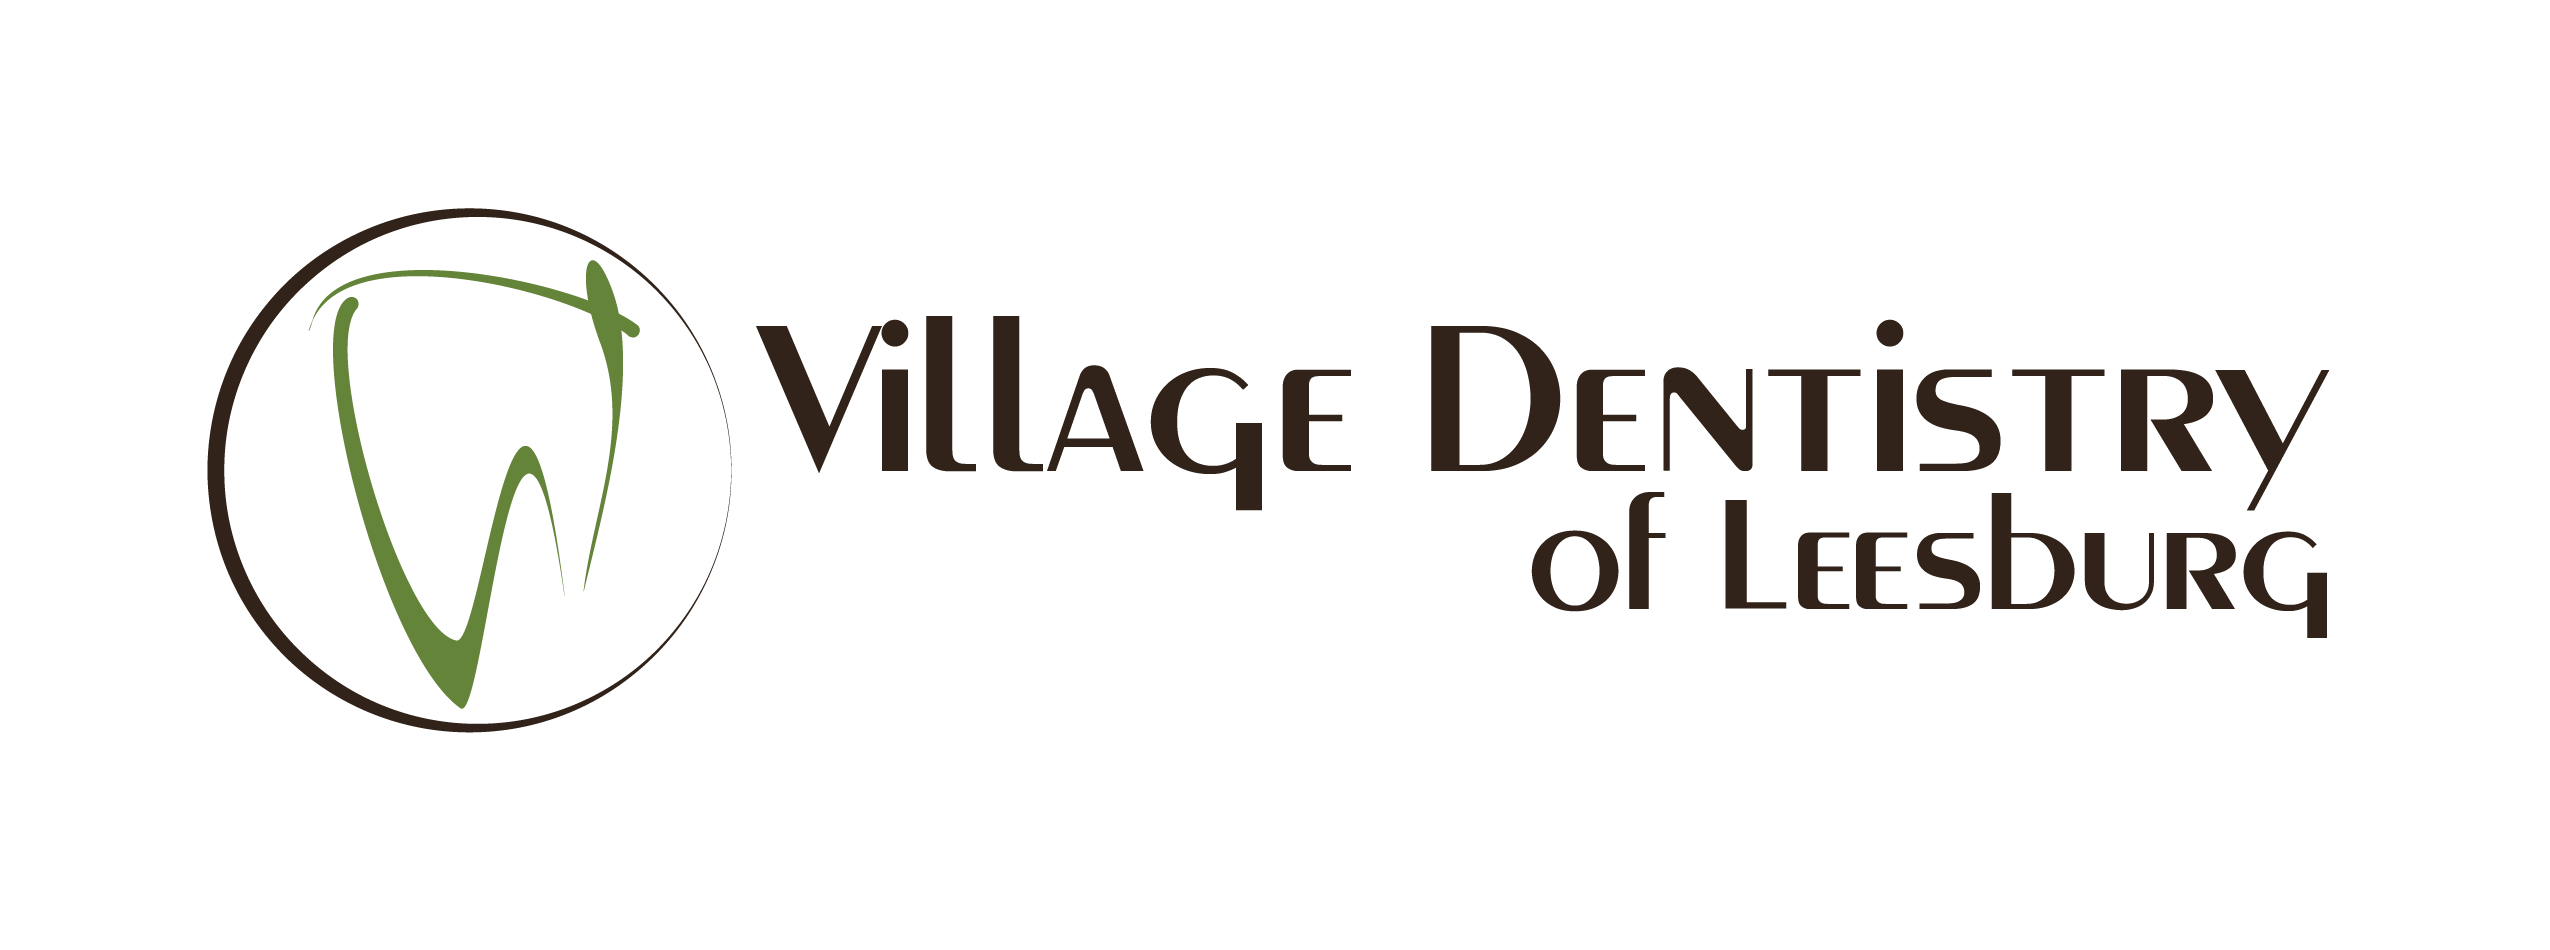 VDL_logo_FINAL